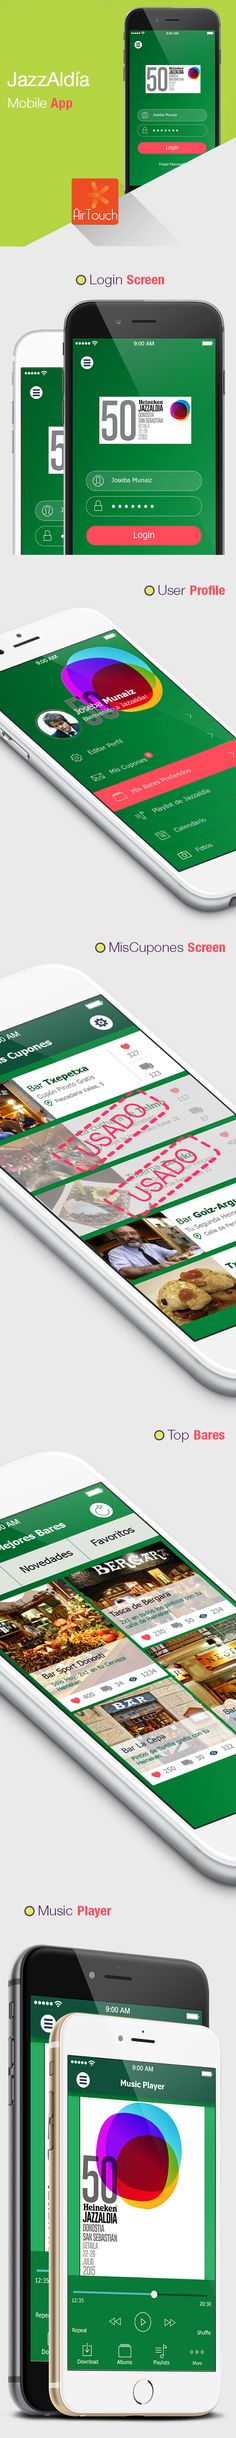 HEINEKEN JAZZALDIA Mobile UI Example by Airtouch New Media